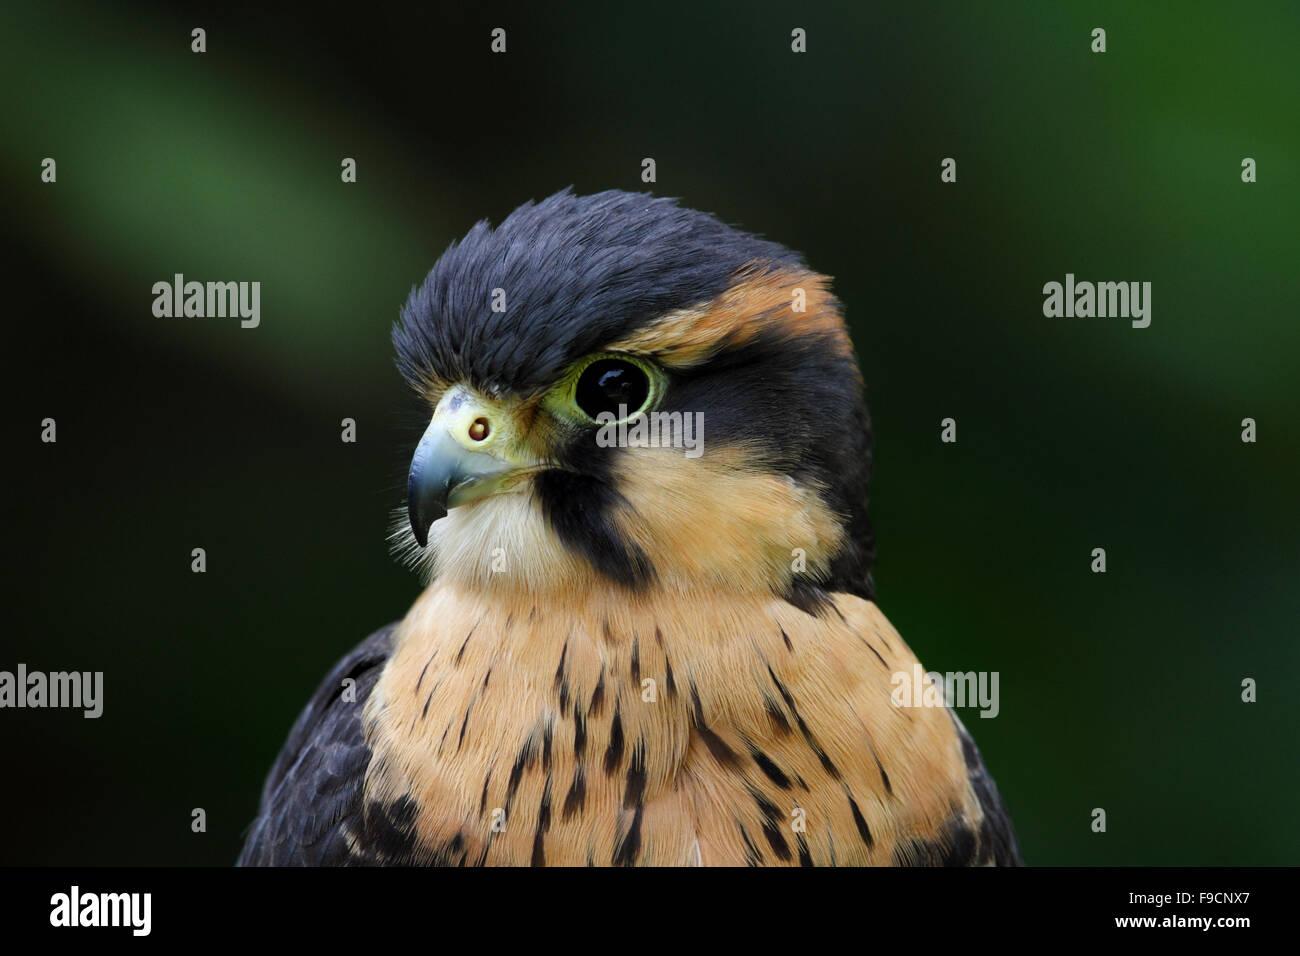 African Crowned Eagle | African crowned eagle, Birds of ...  |African Crowned Eagle Falconry